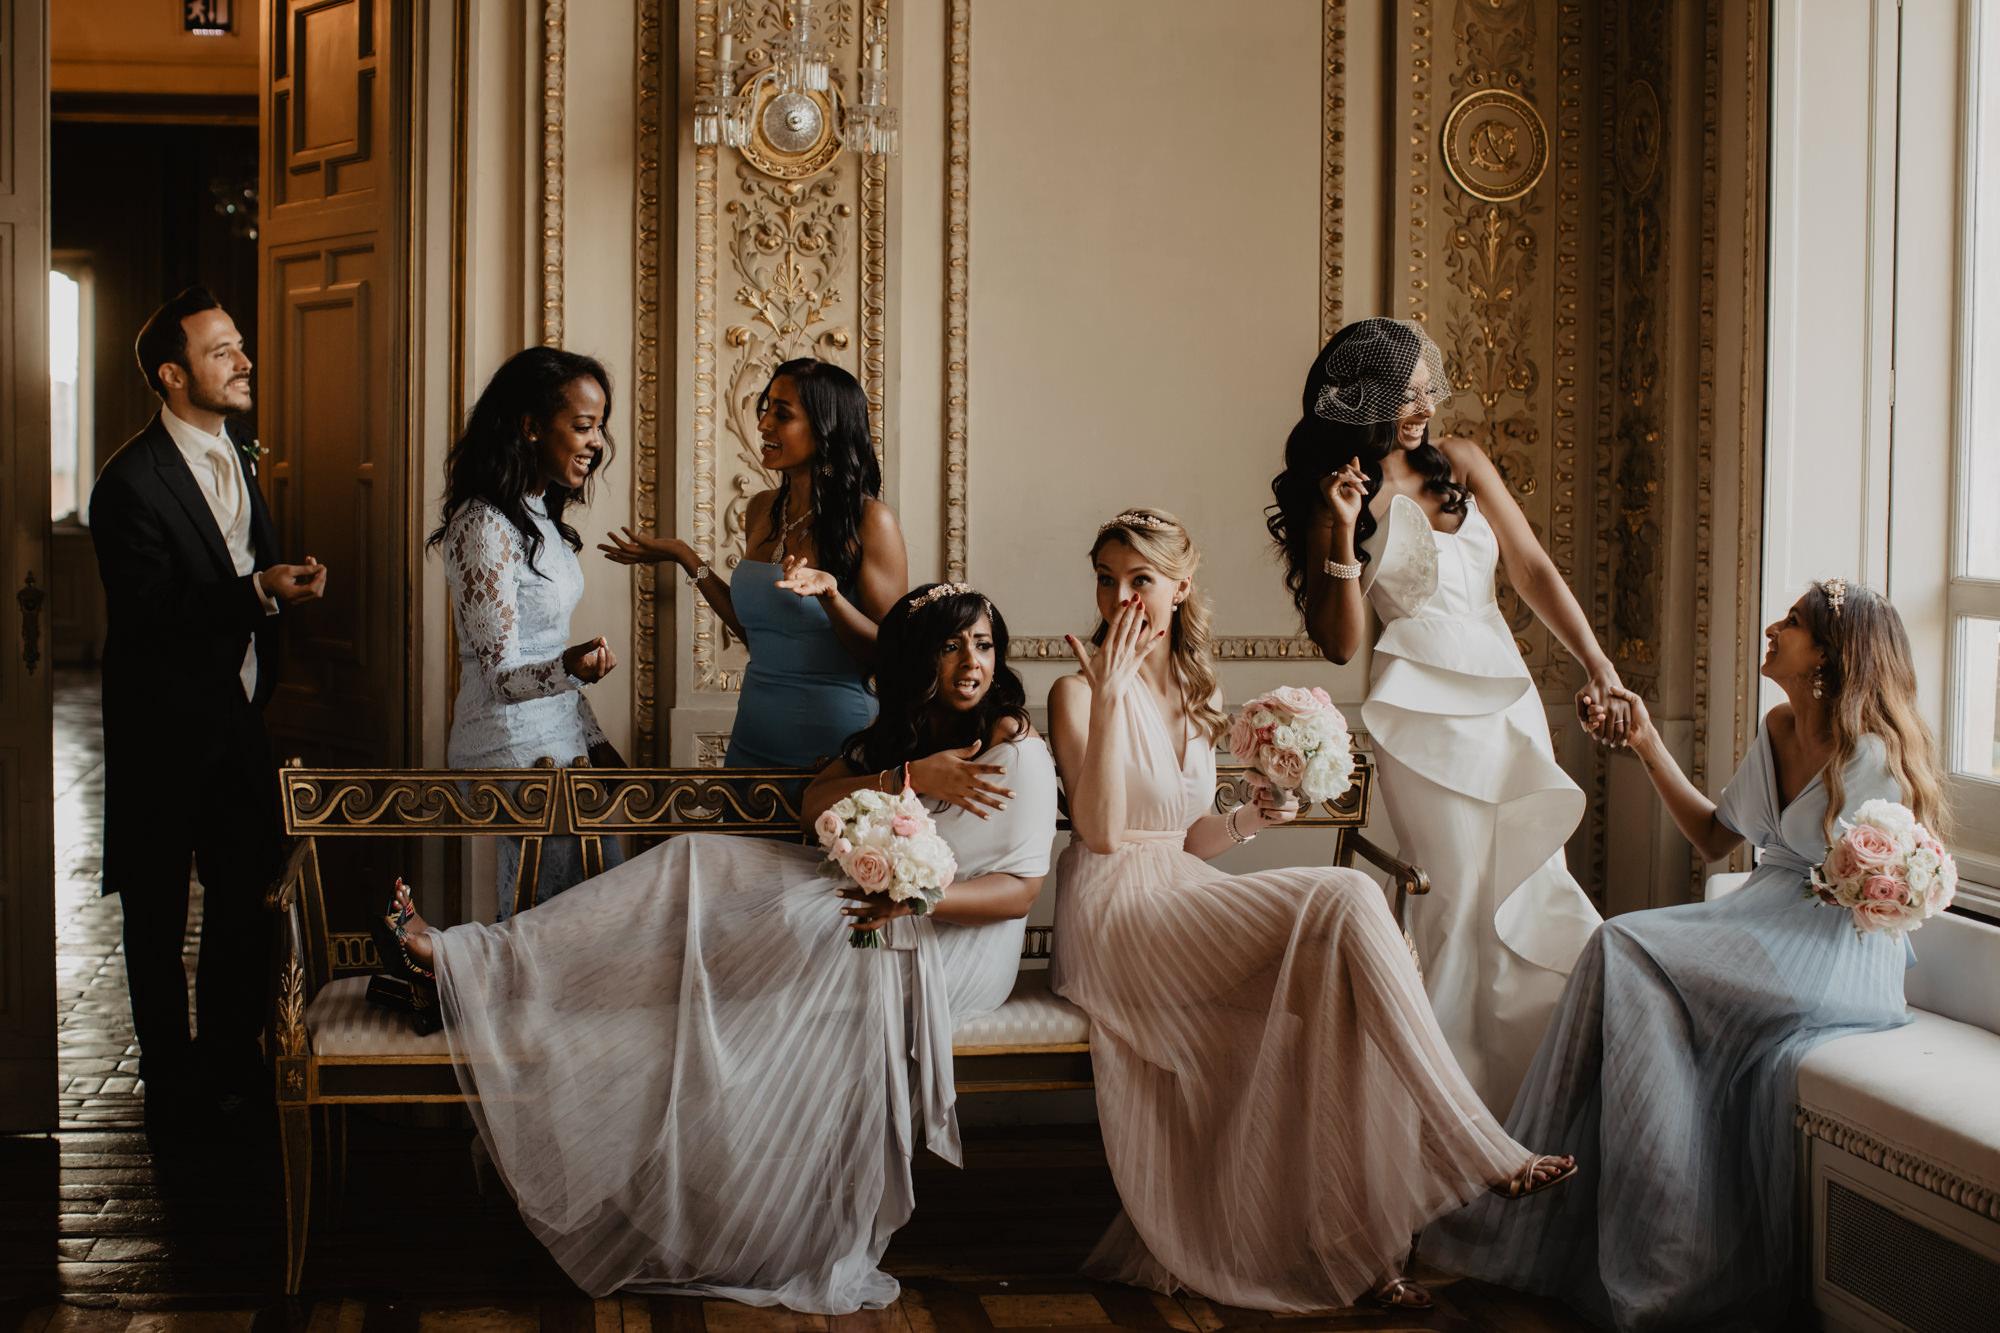 Candid bridal party photo by David Bastianoni